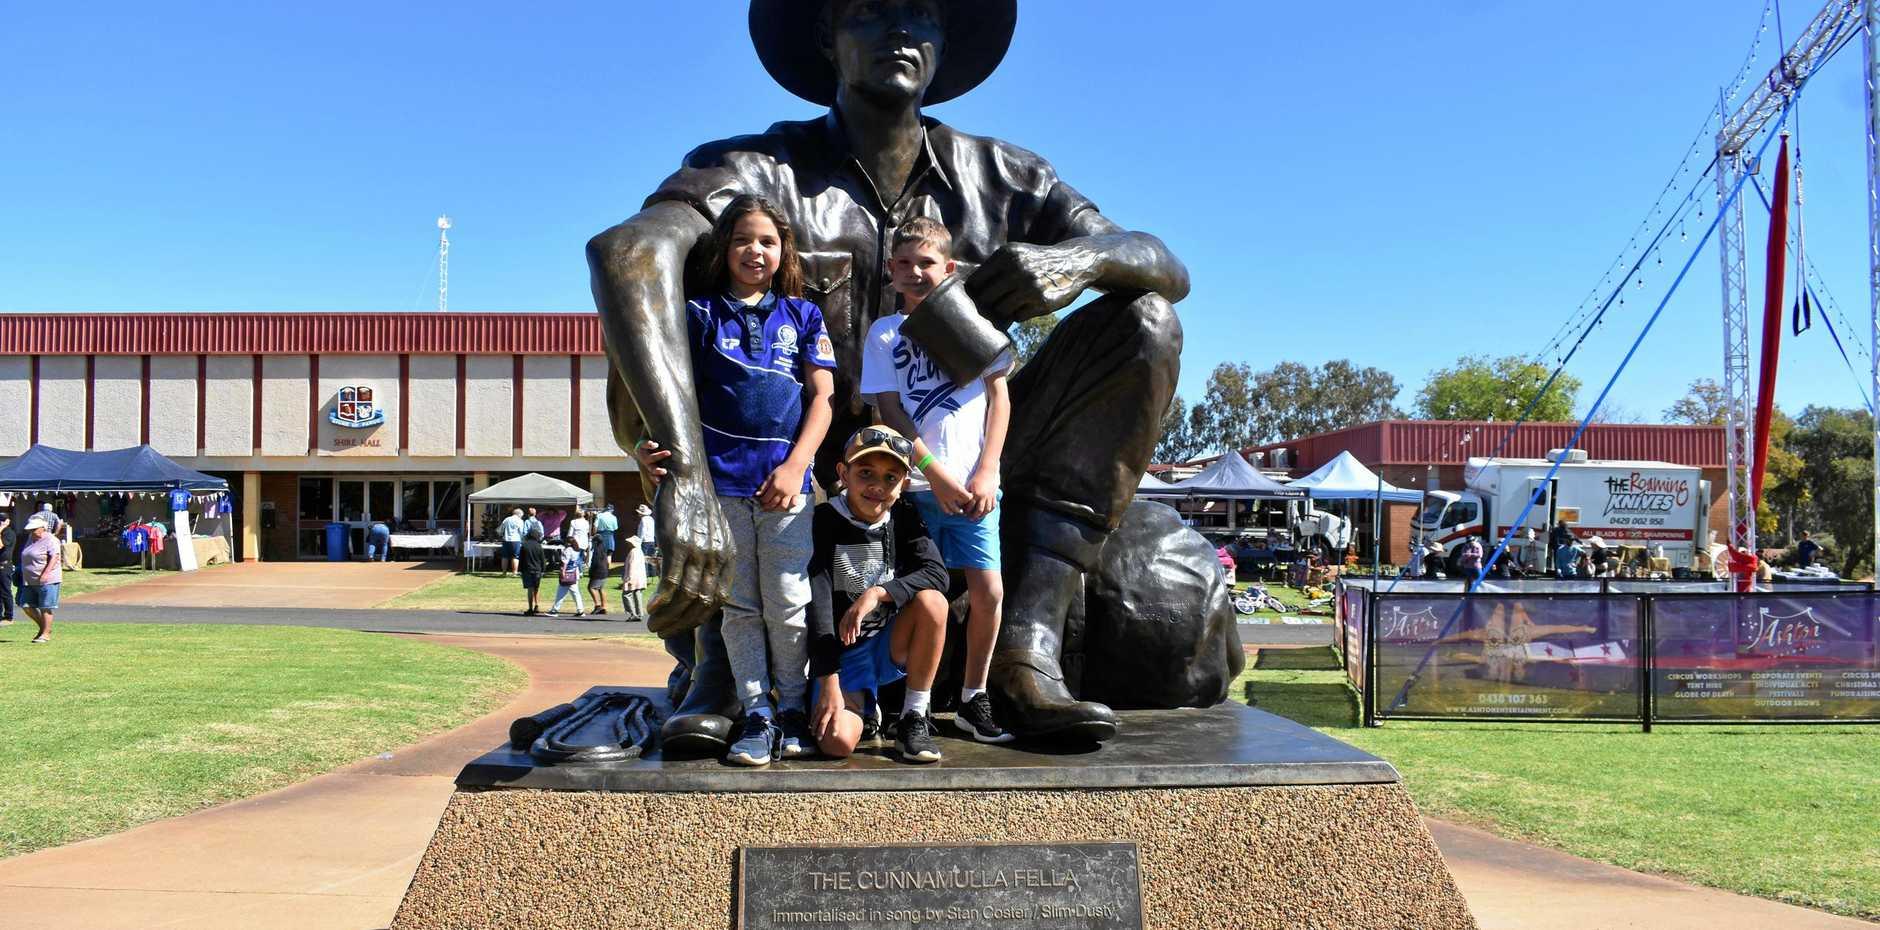 FESTIVAL FUN: Corey Maxwell, Kayden Munn and Paige Tanner on the Cunnamulla Fella statue.